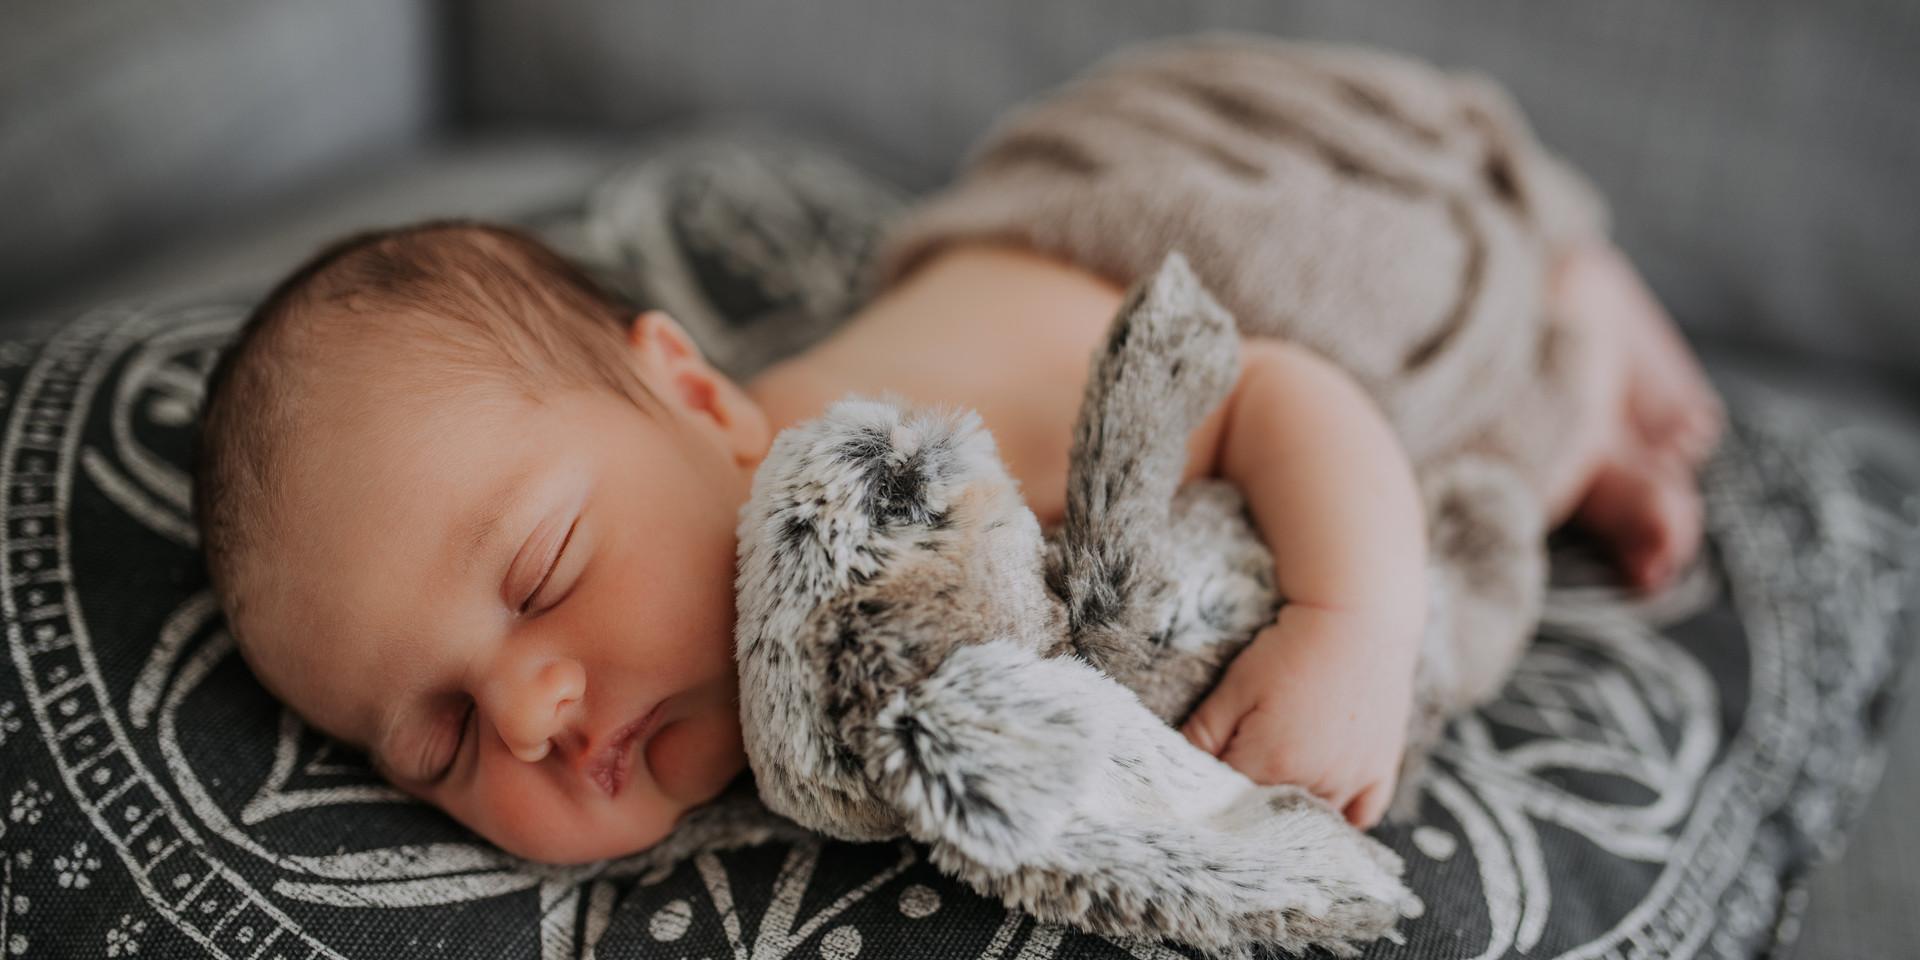 Newborn Baby Home Photoshoot with bunny